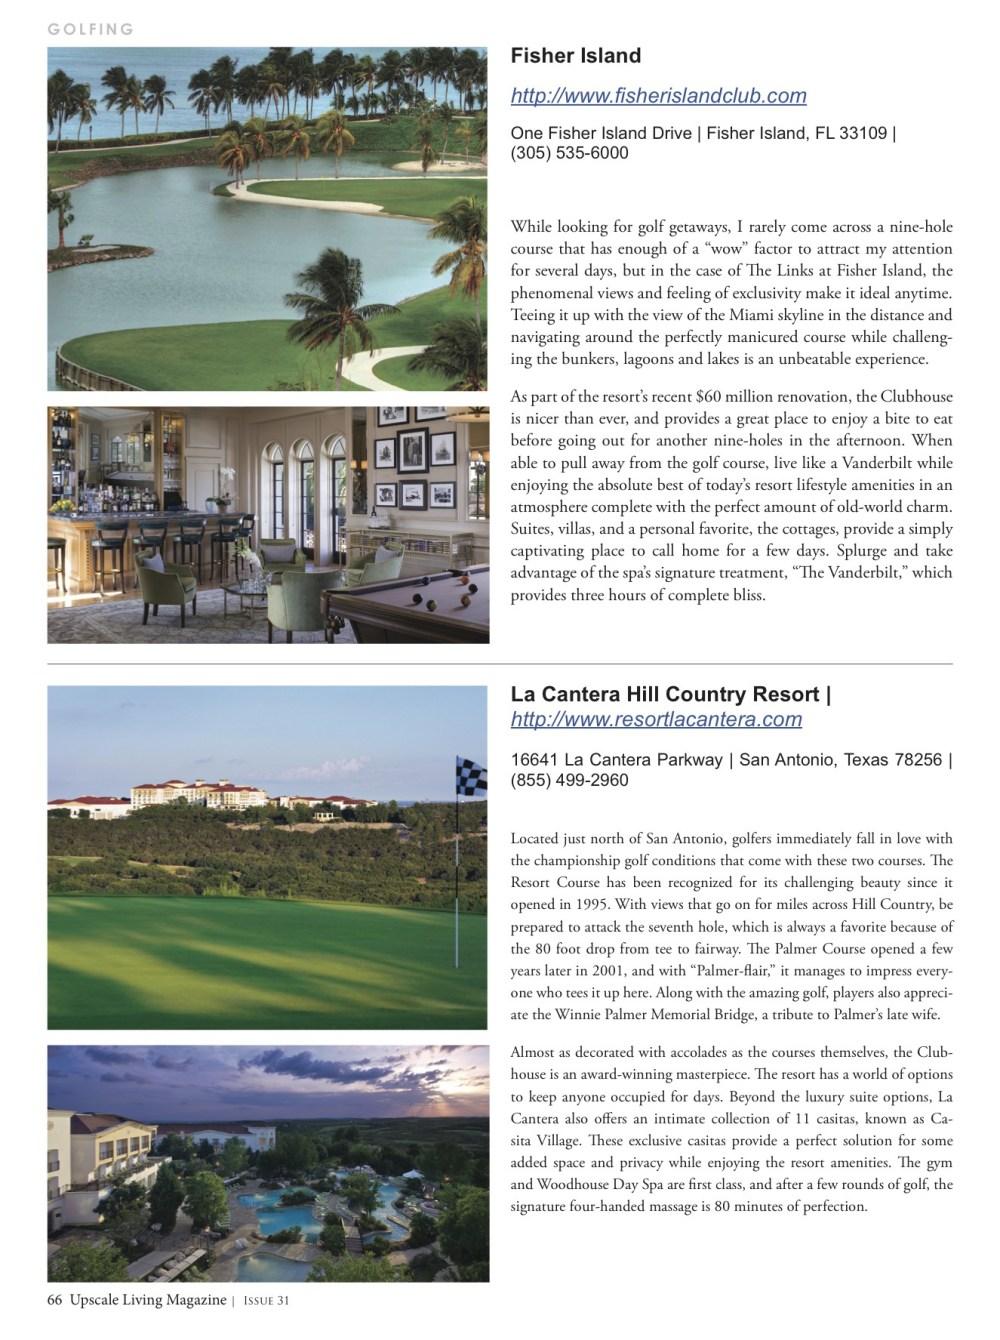 ULM_DamonMBanks_Golf_2